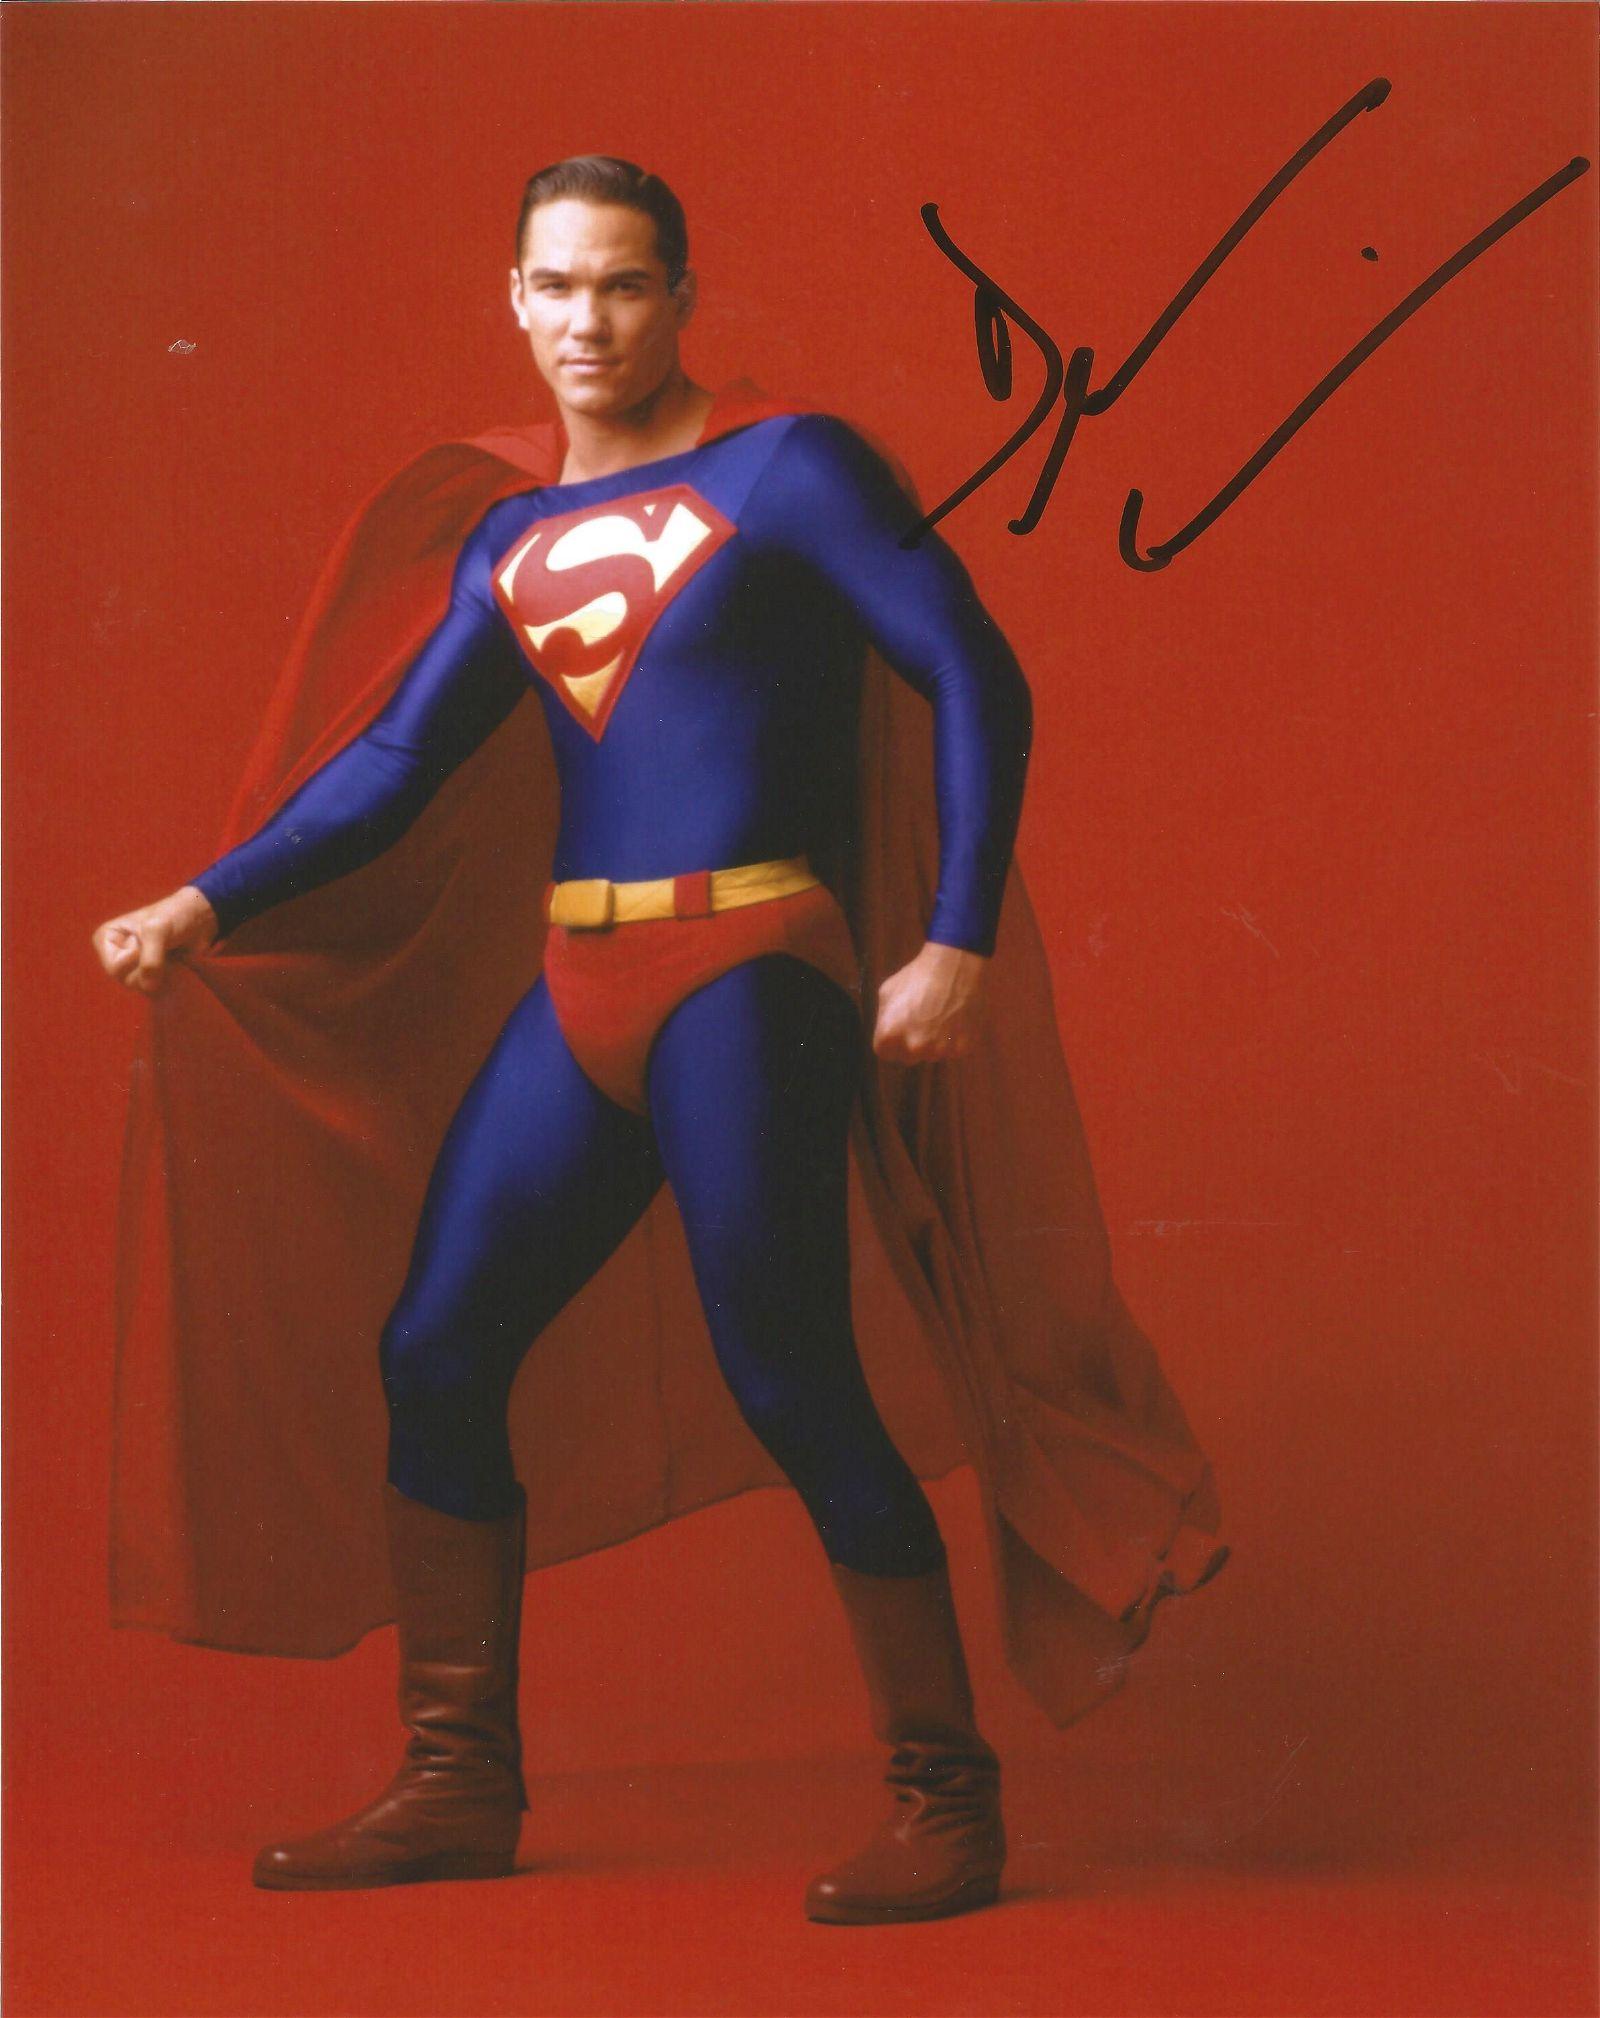 Dean Cain signed 10x8 colour photograph taken during